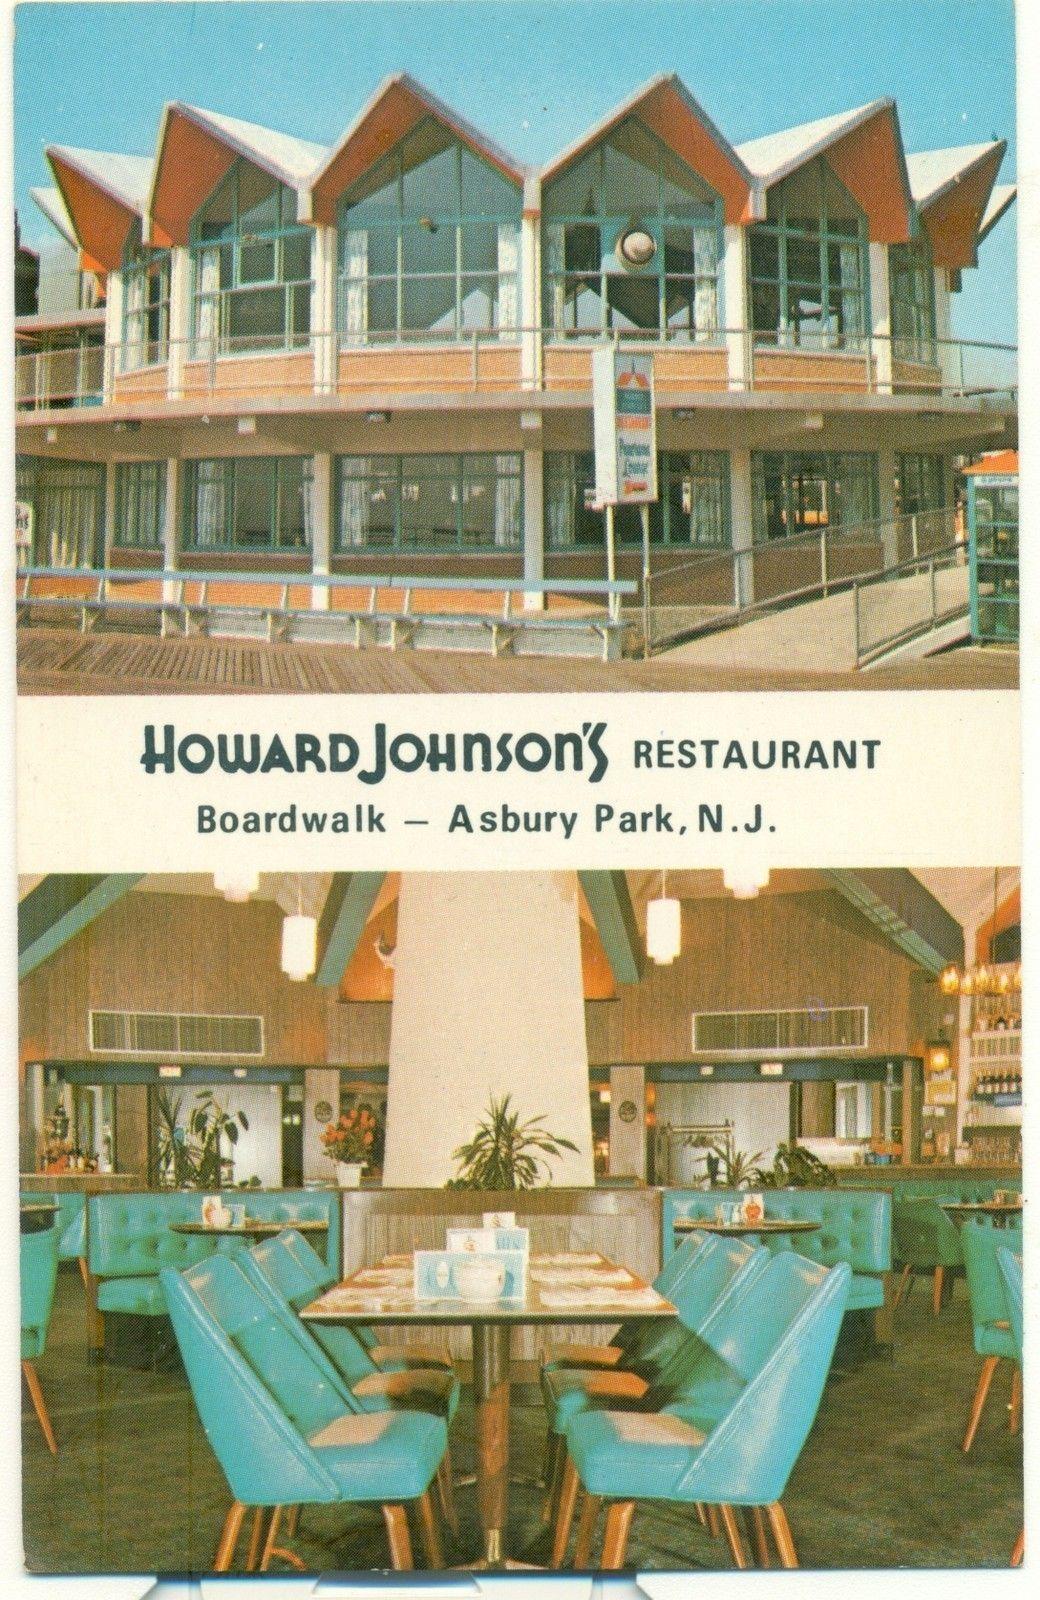 Howard Johnsons Restaurant Boardwalk Asbury Park Nj Pinterest